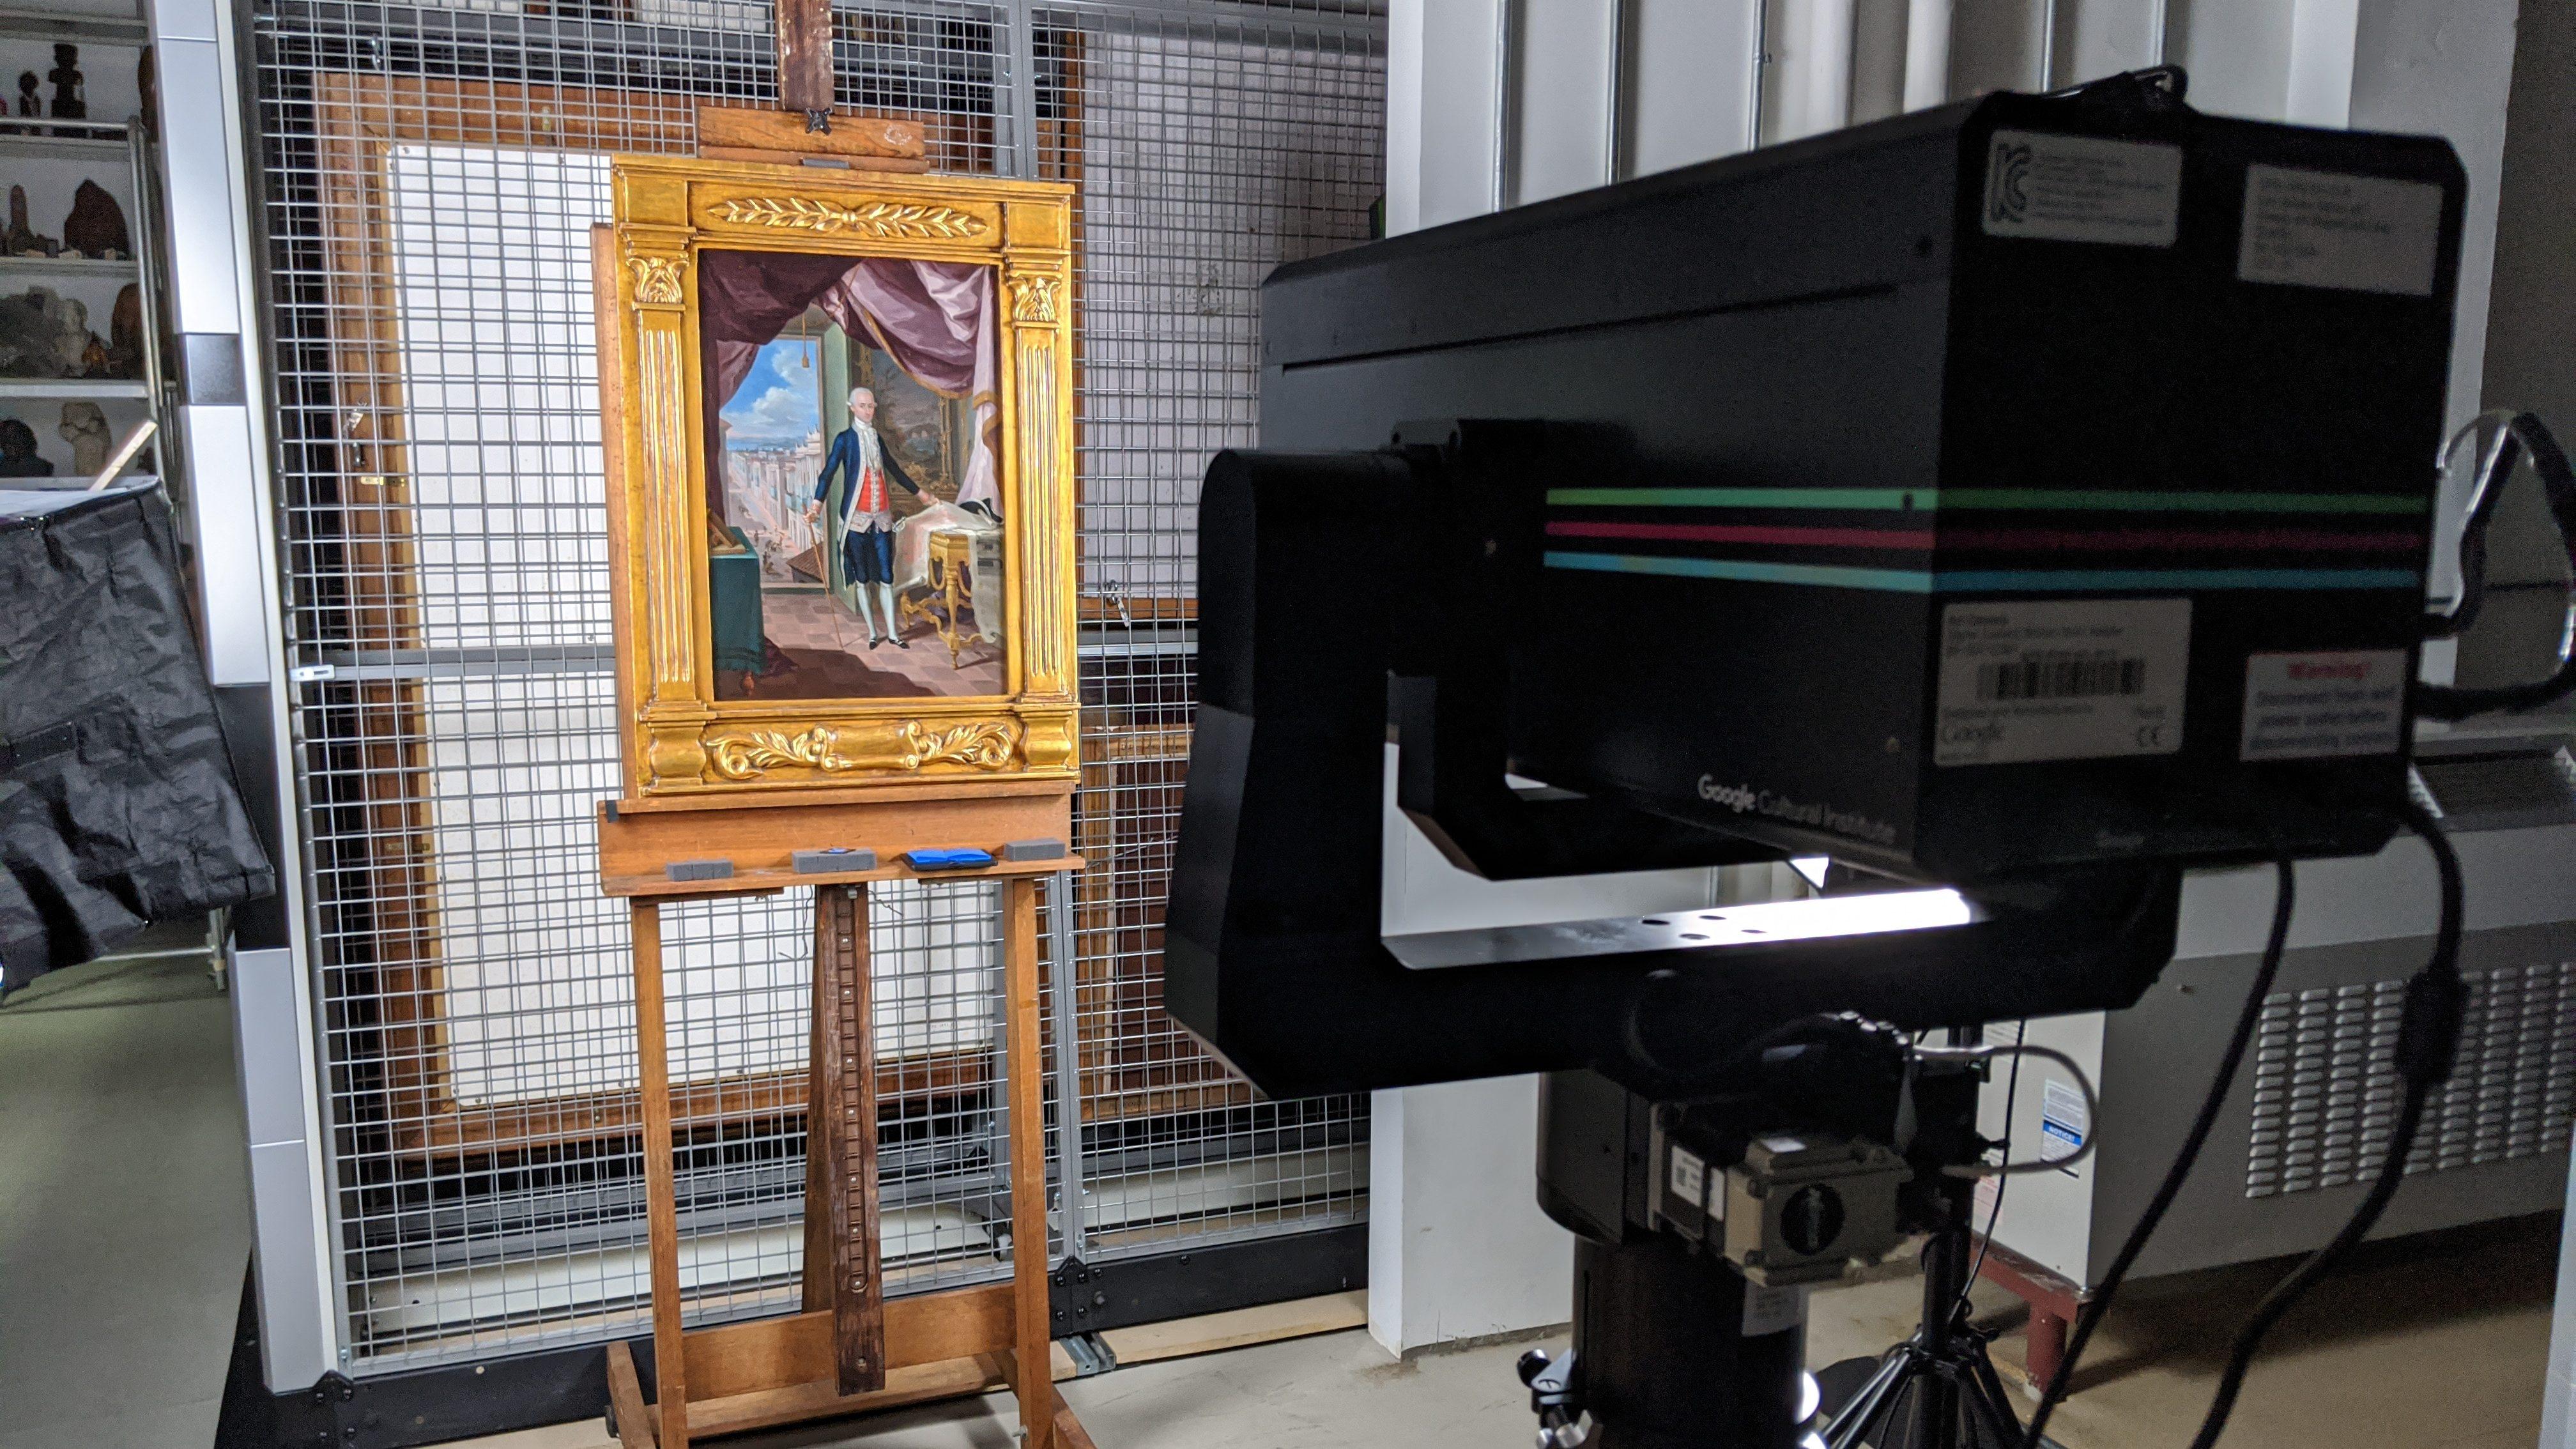 Google's Art Camera scanning a painting at Instituto de Cultura Puertorriqueña